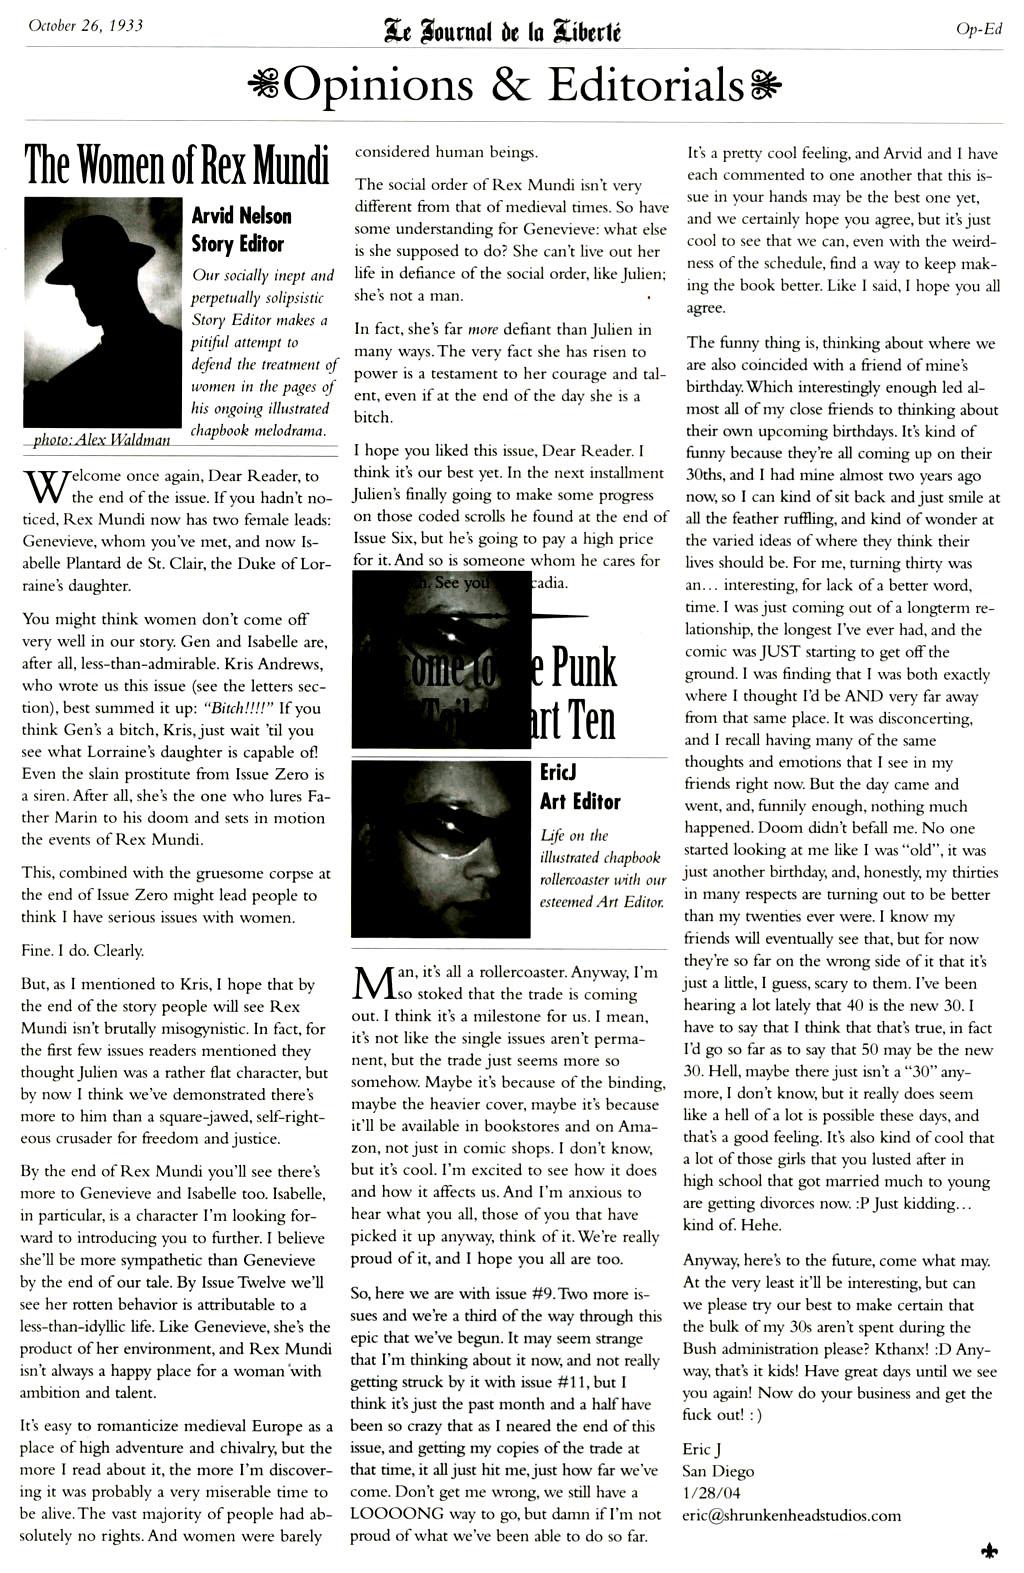 Read online Rex Mundi comic -  Issue #9 - 27